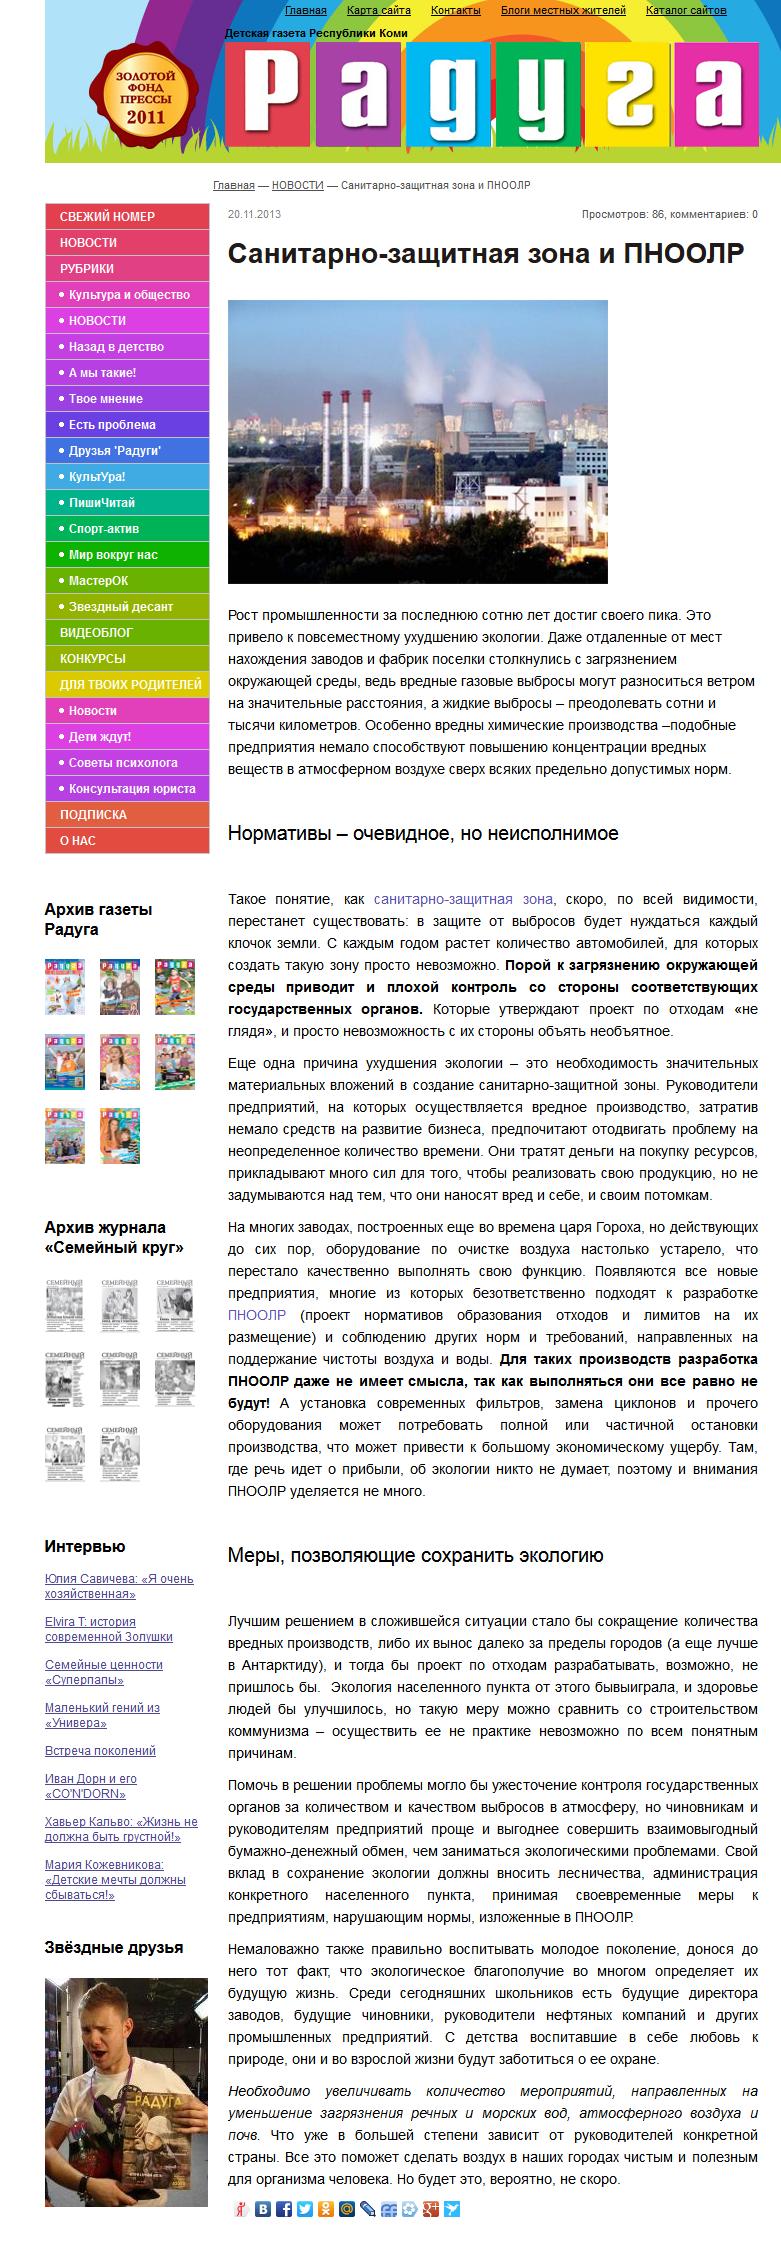 FireShot Screen Capture #012 - 'Санитарно-защитная зона и ПНООЛР' - gazetaraduga_ru_novosti_sanitarno-zaschitnaya-zona-i-pnoolr-20-11-2013_html